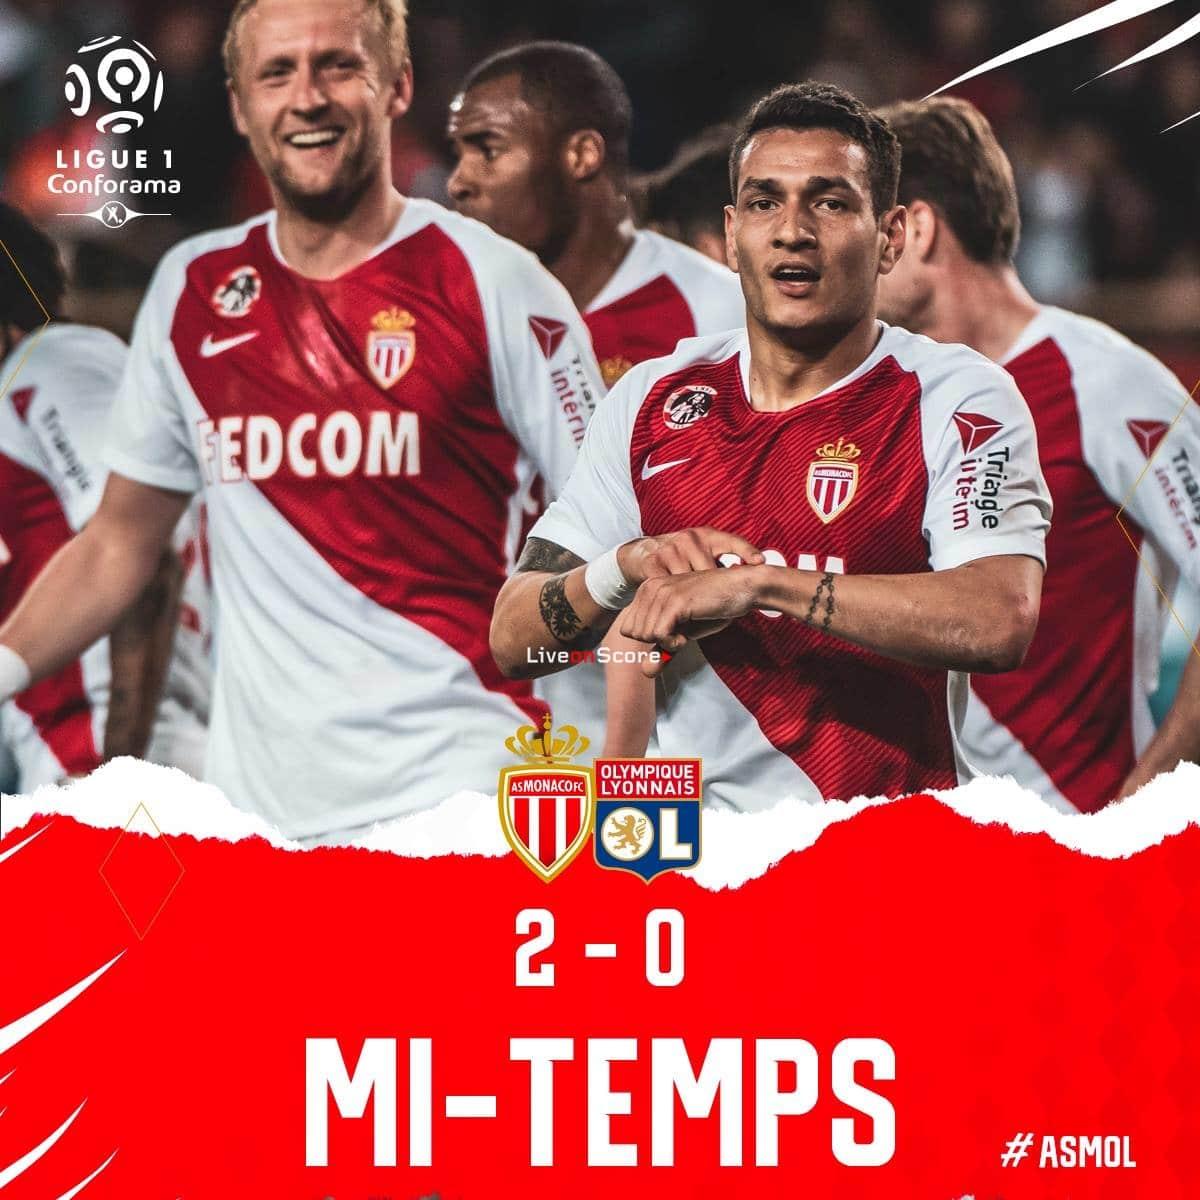 Monaco 2-0 Lyon Full Highlight Video – France Ligue 1 2019